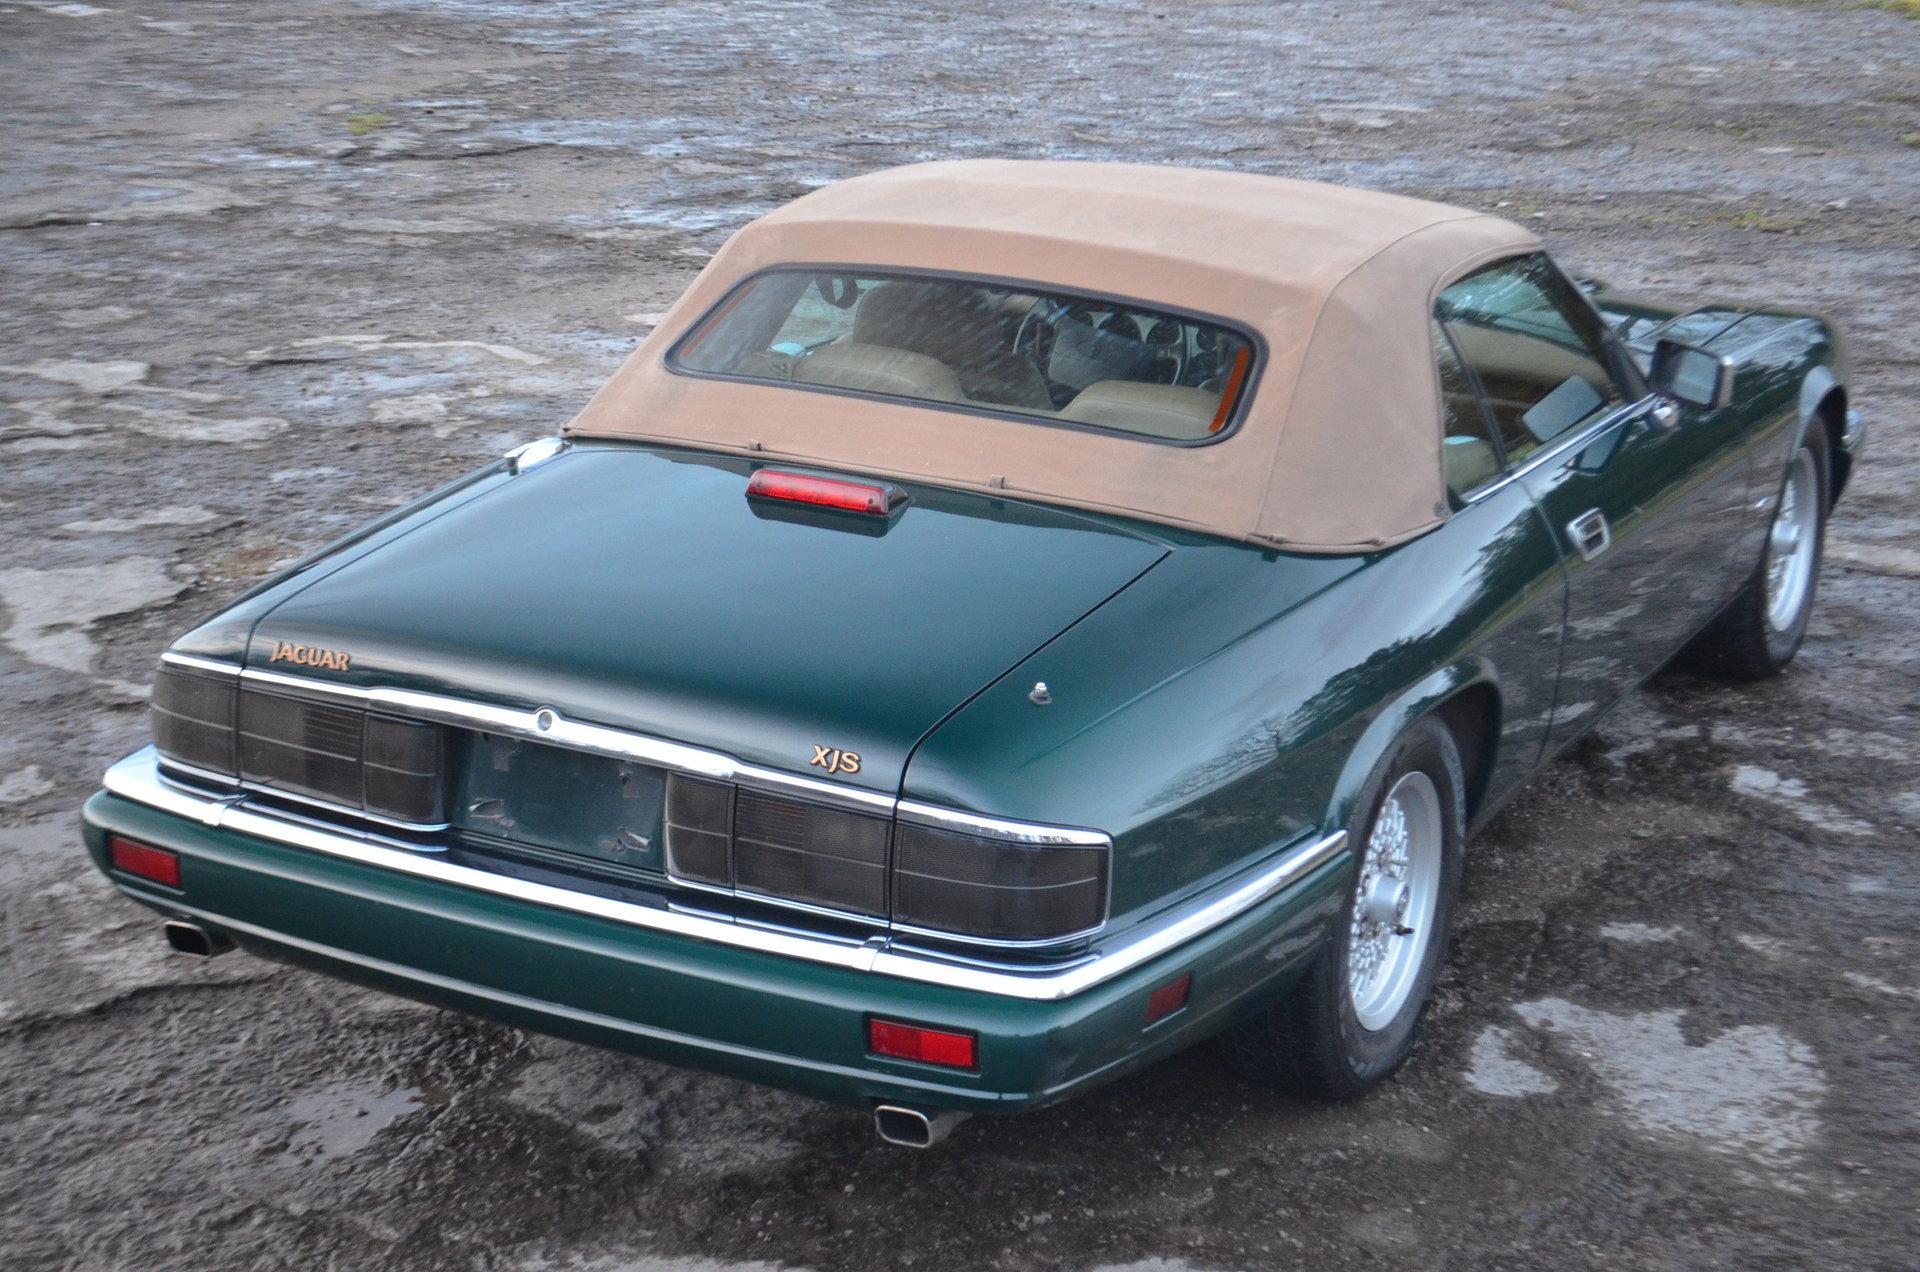 1994 Jaguar XJS | Frazier Motorcar Company